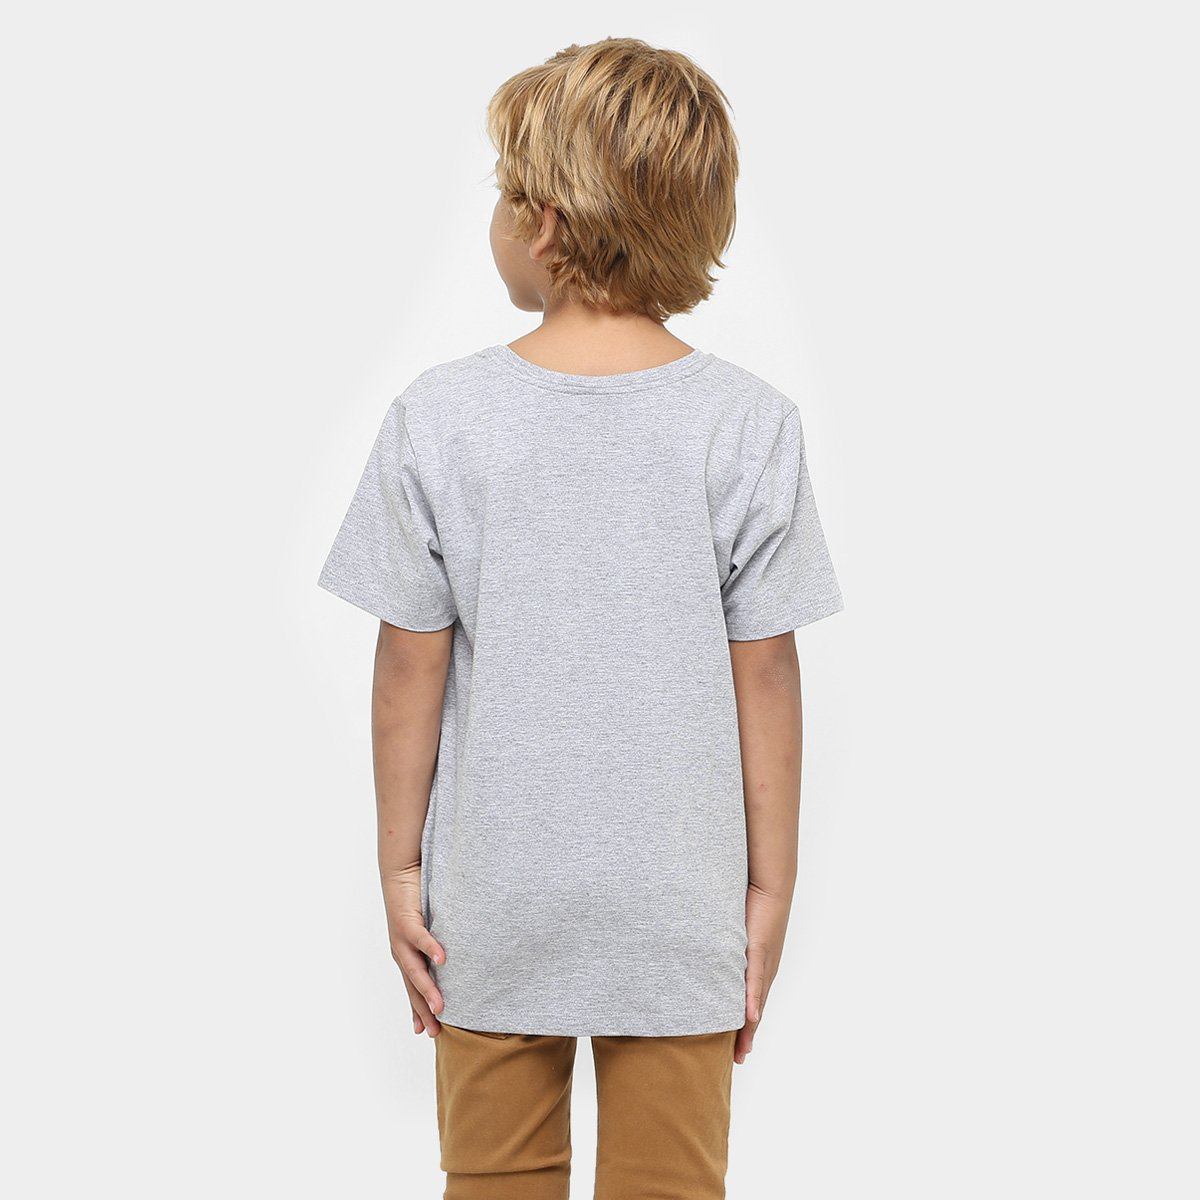 Infantil Camiseta Disney Wars Camiseta Disney Mescla Star Star z1qWRHRTn